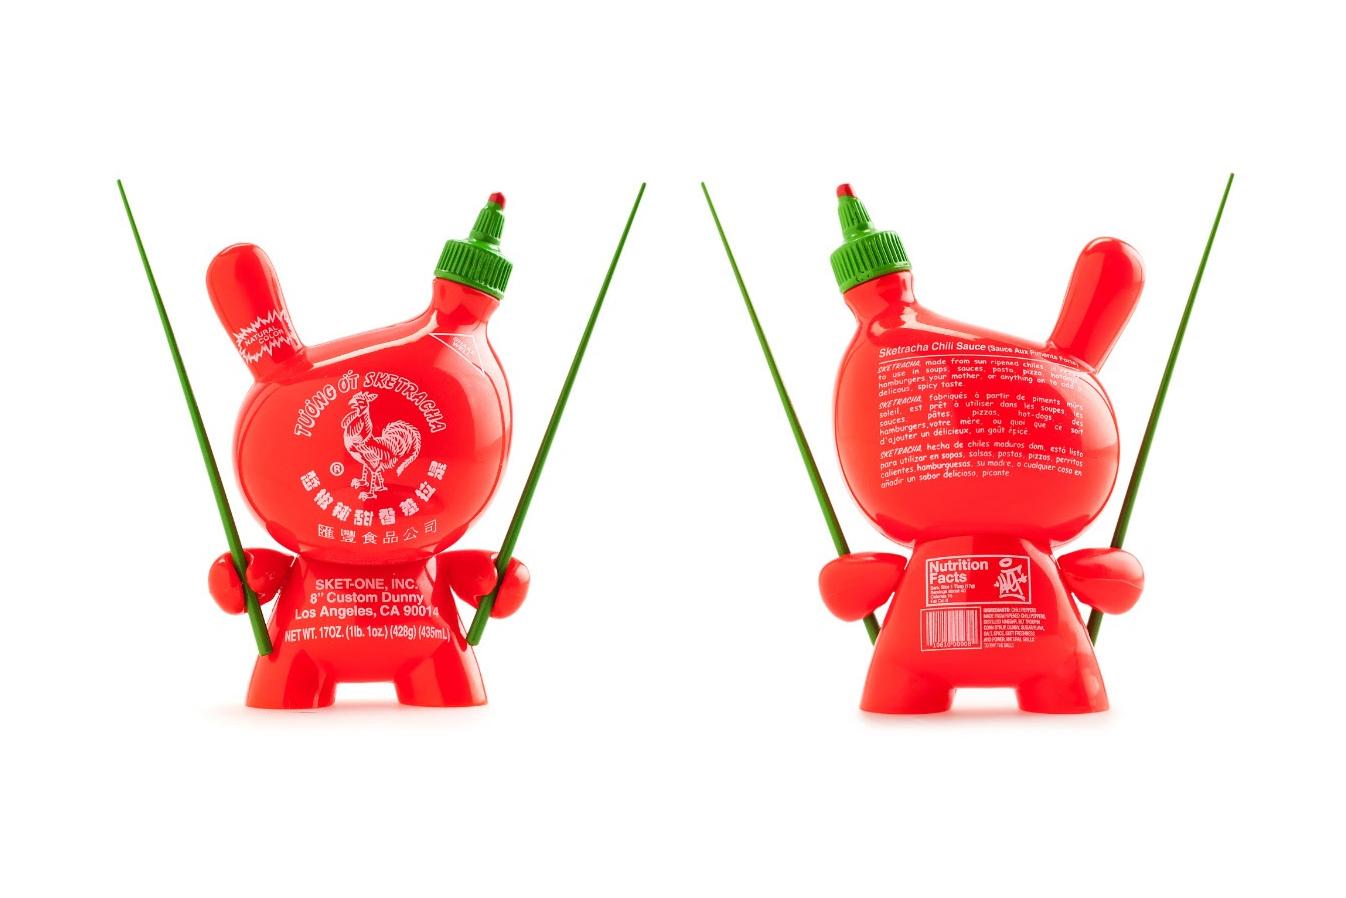 Kidrobot & Sket One Transform the Dunny Into a Sriracha Bottle